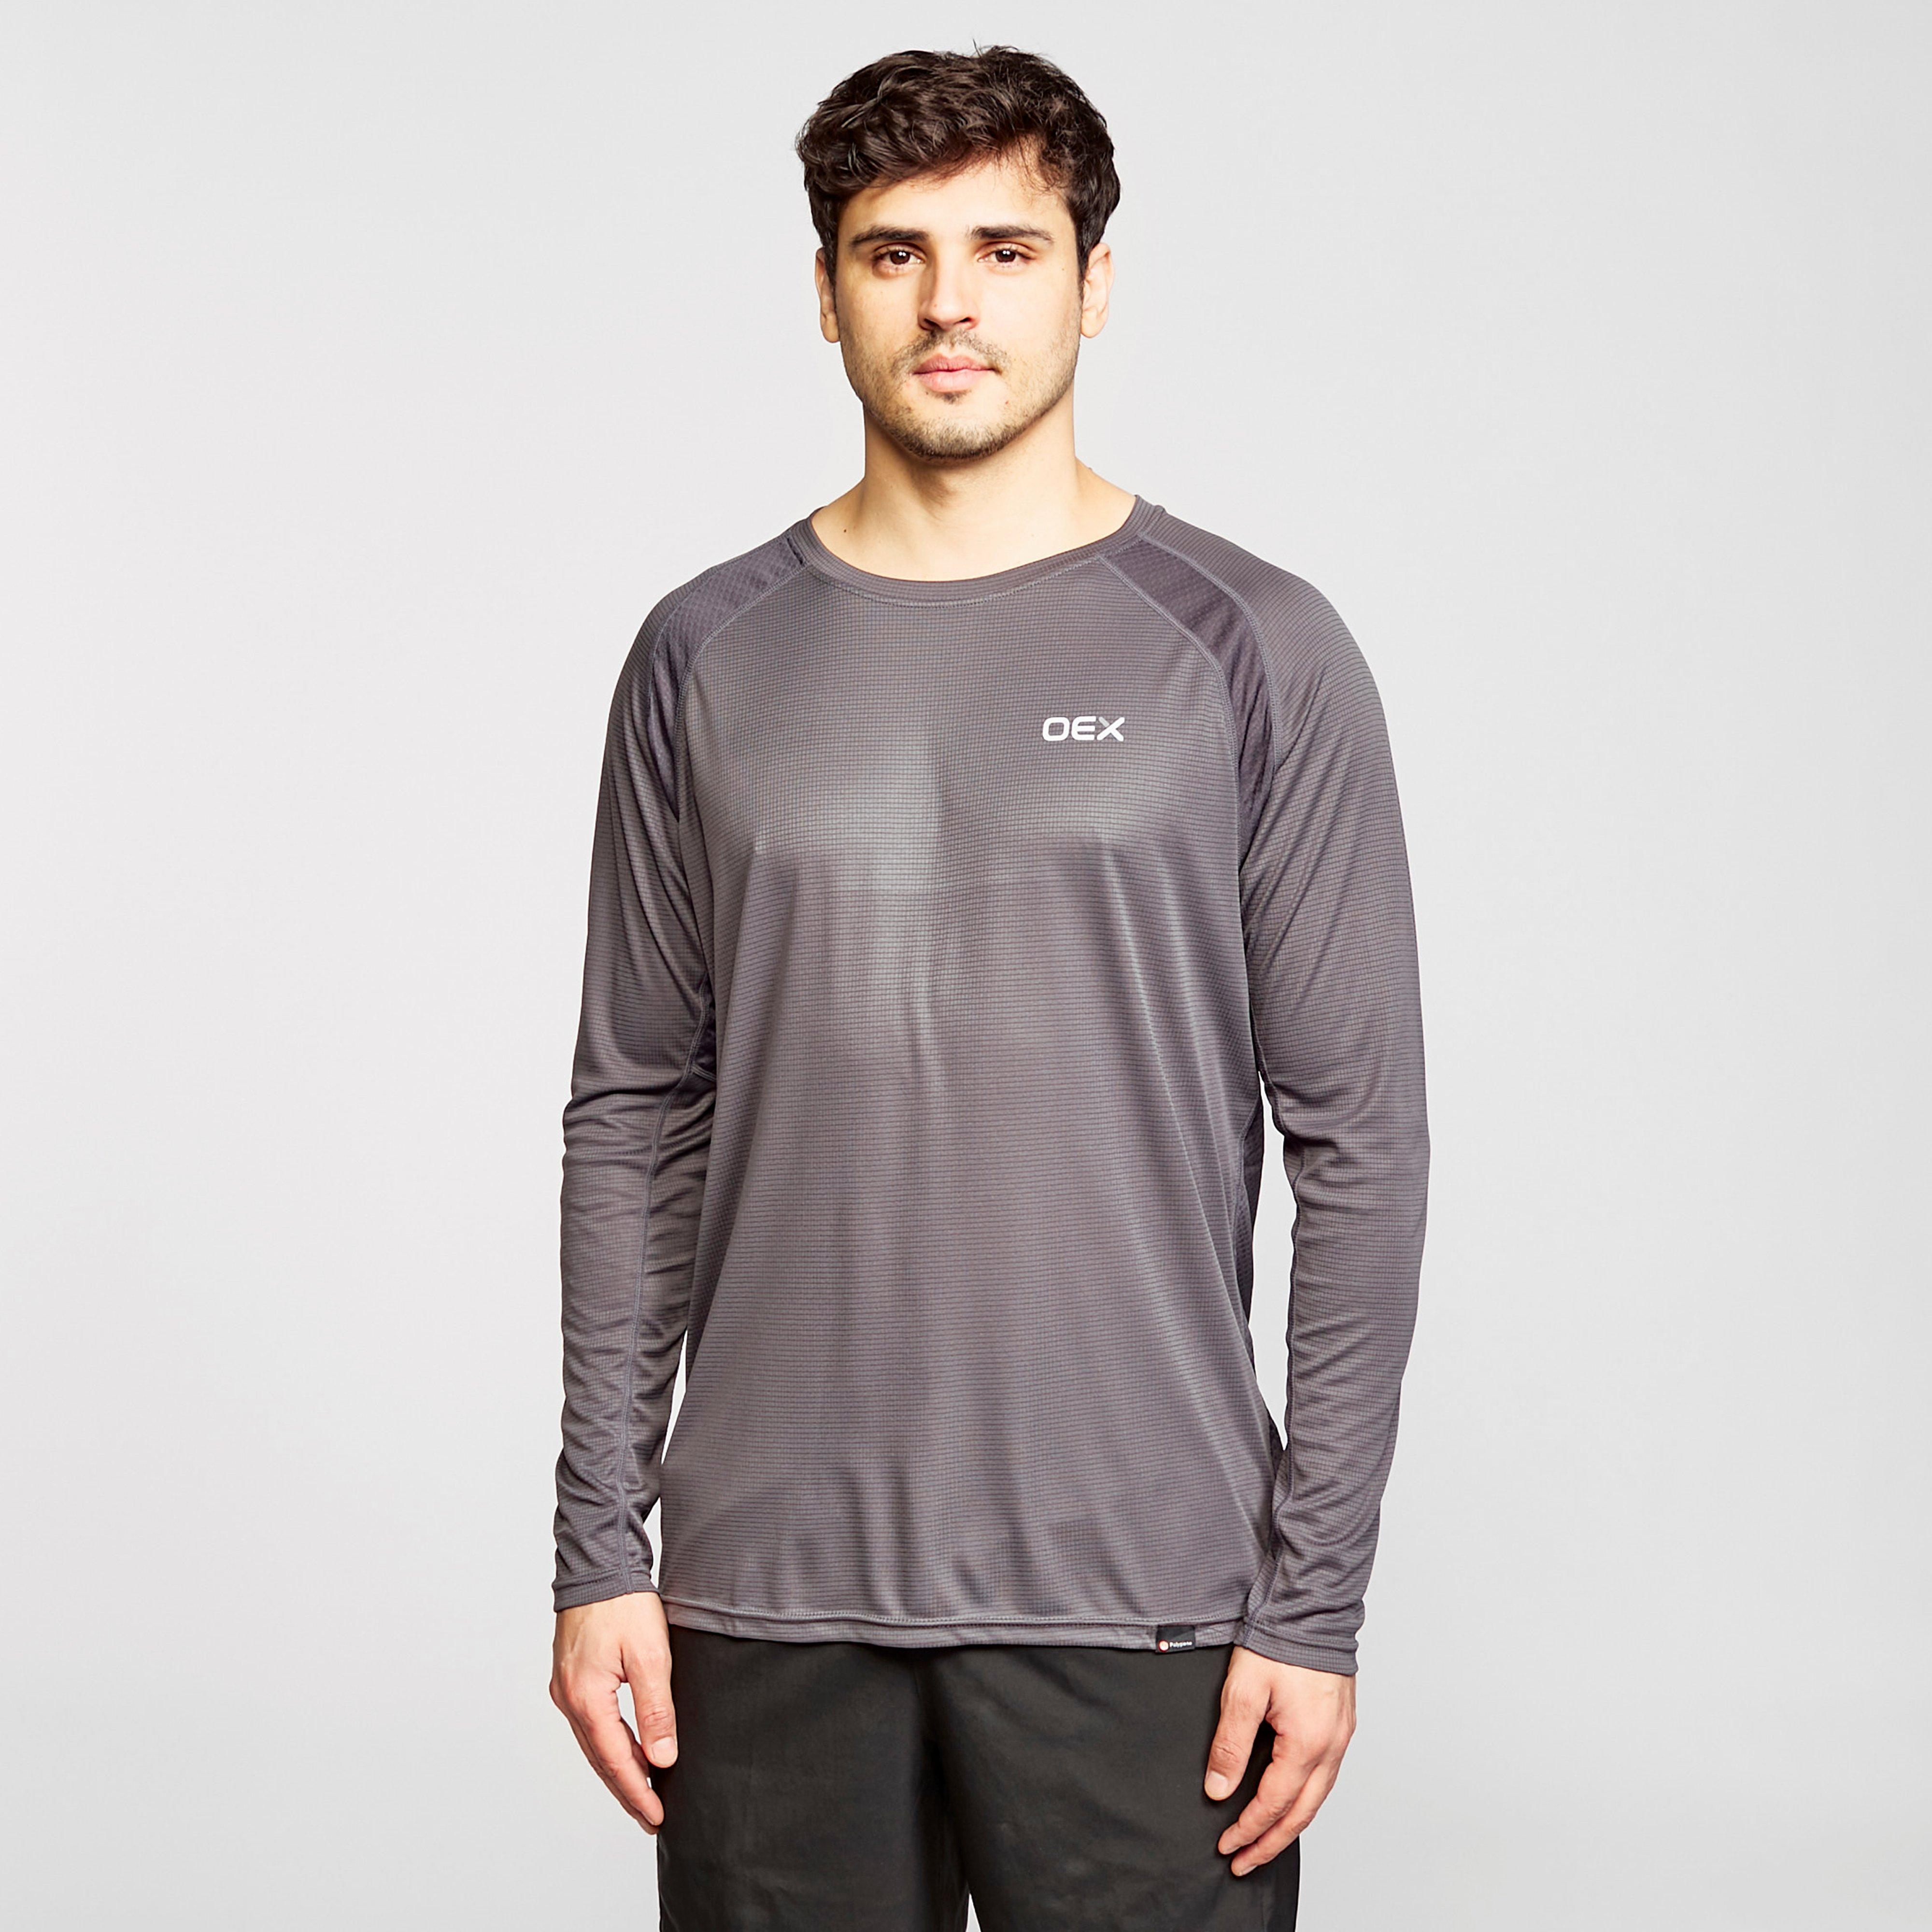 Oex Oex Mens Zephyr Long Sleeve T-Shirt, Purple